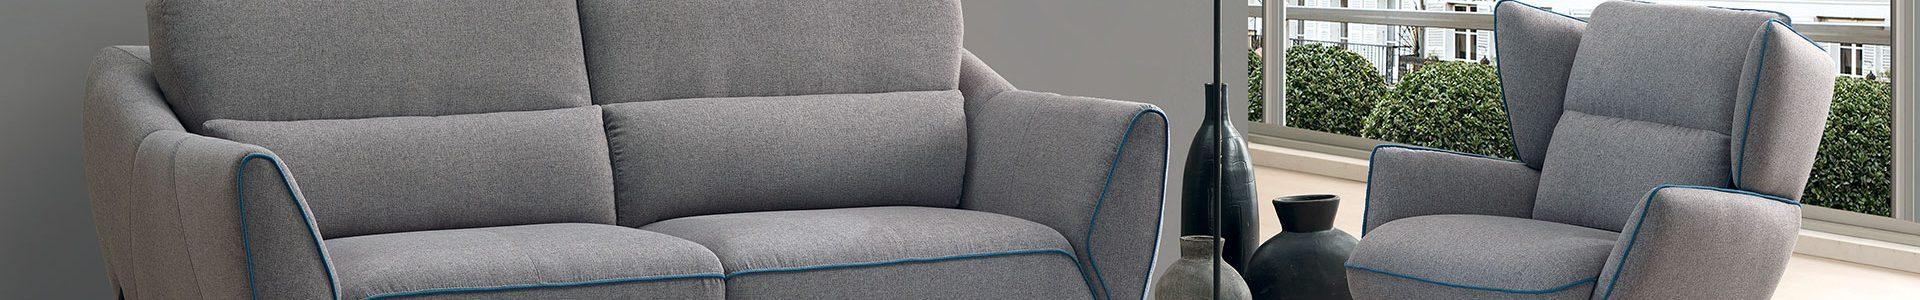 bien choisir son canap story. Black Bedroom Furniture Sets. Home Design Ideas